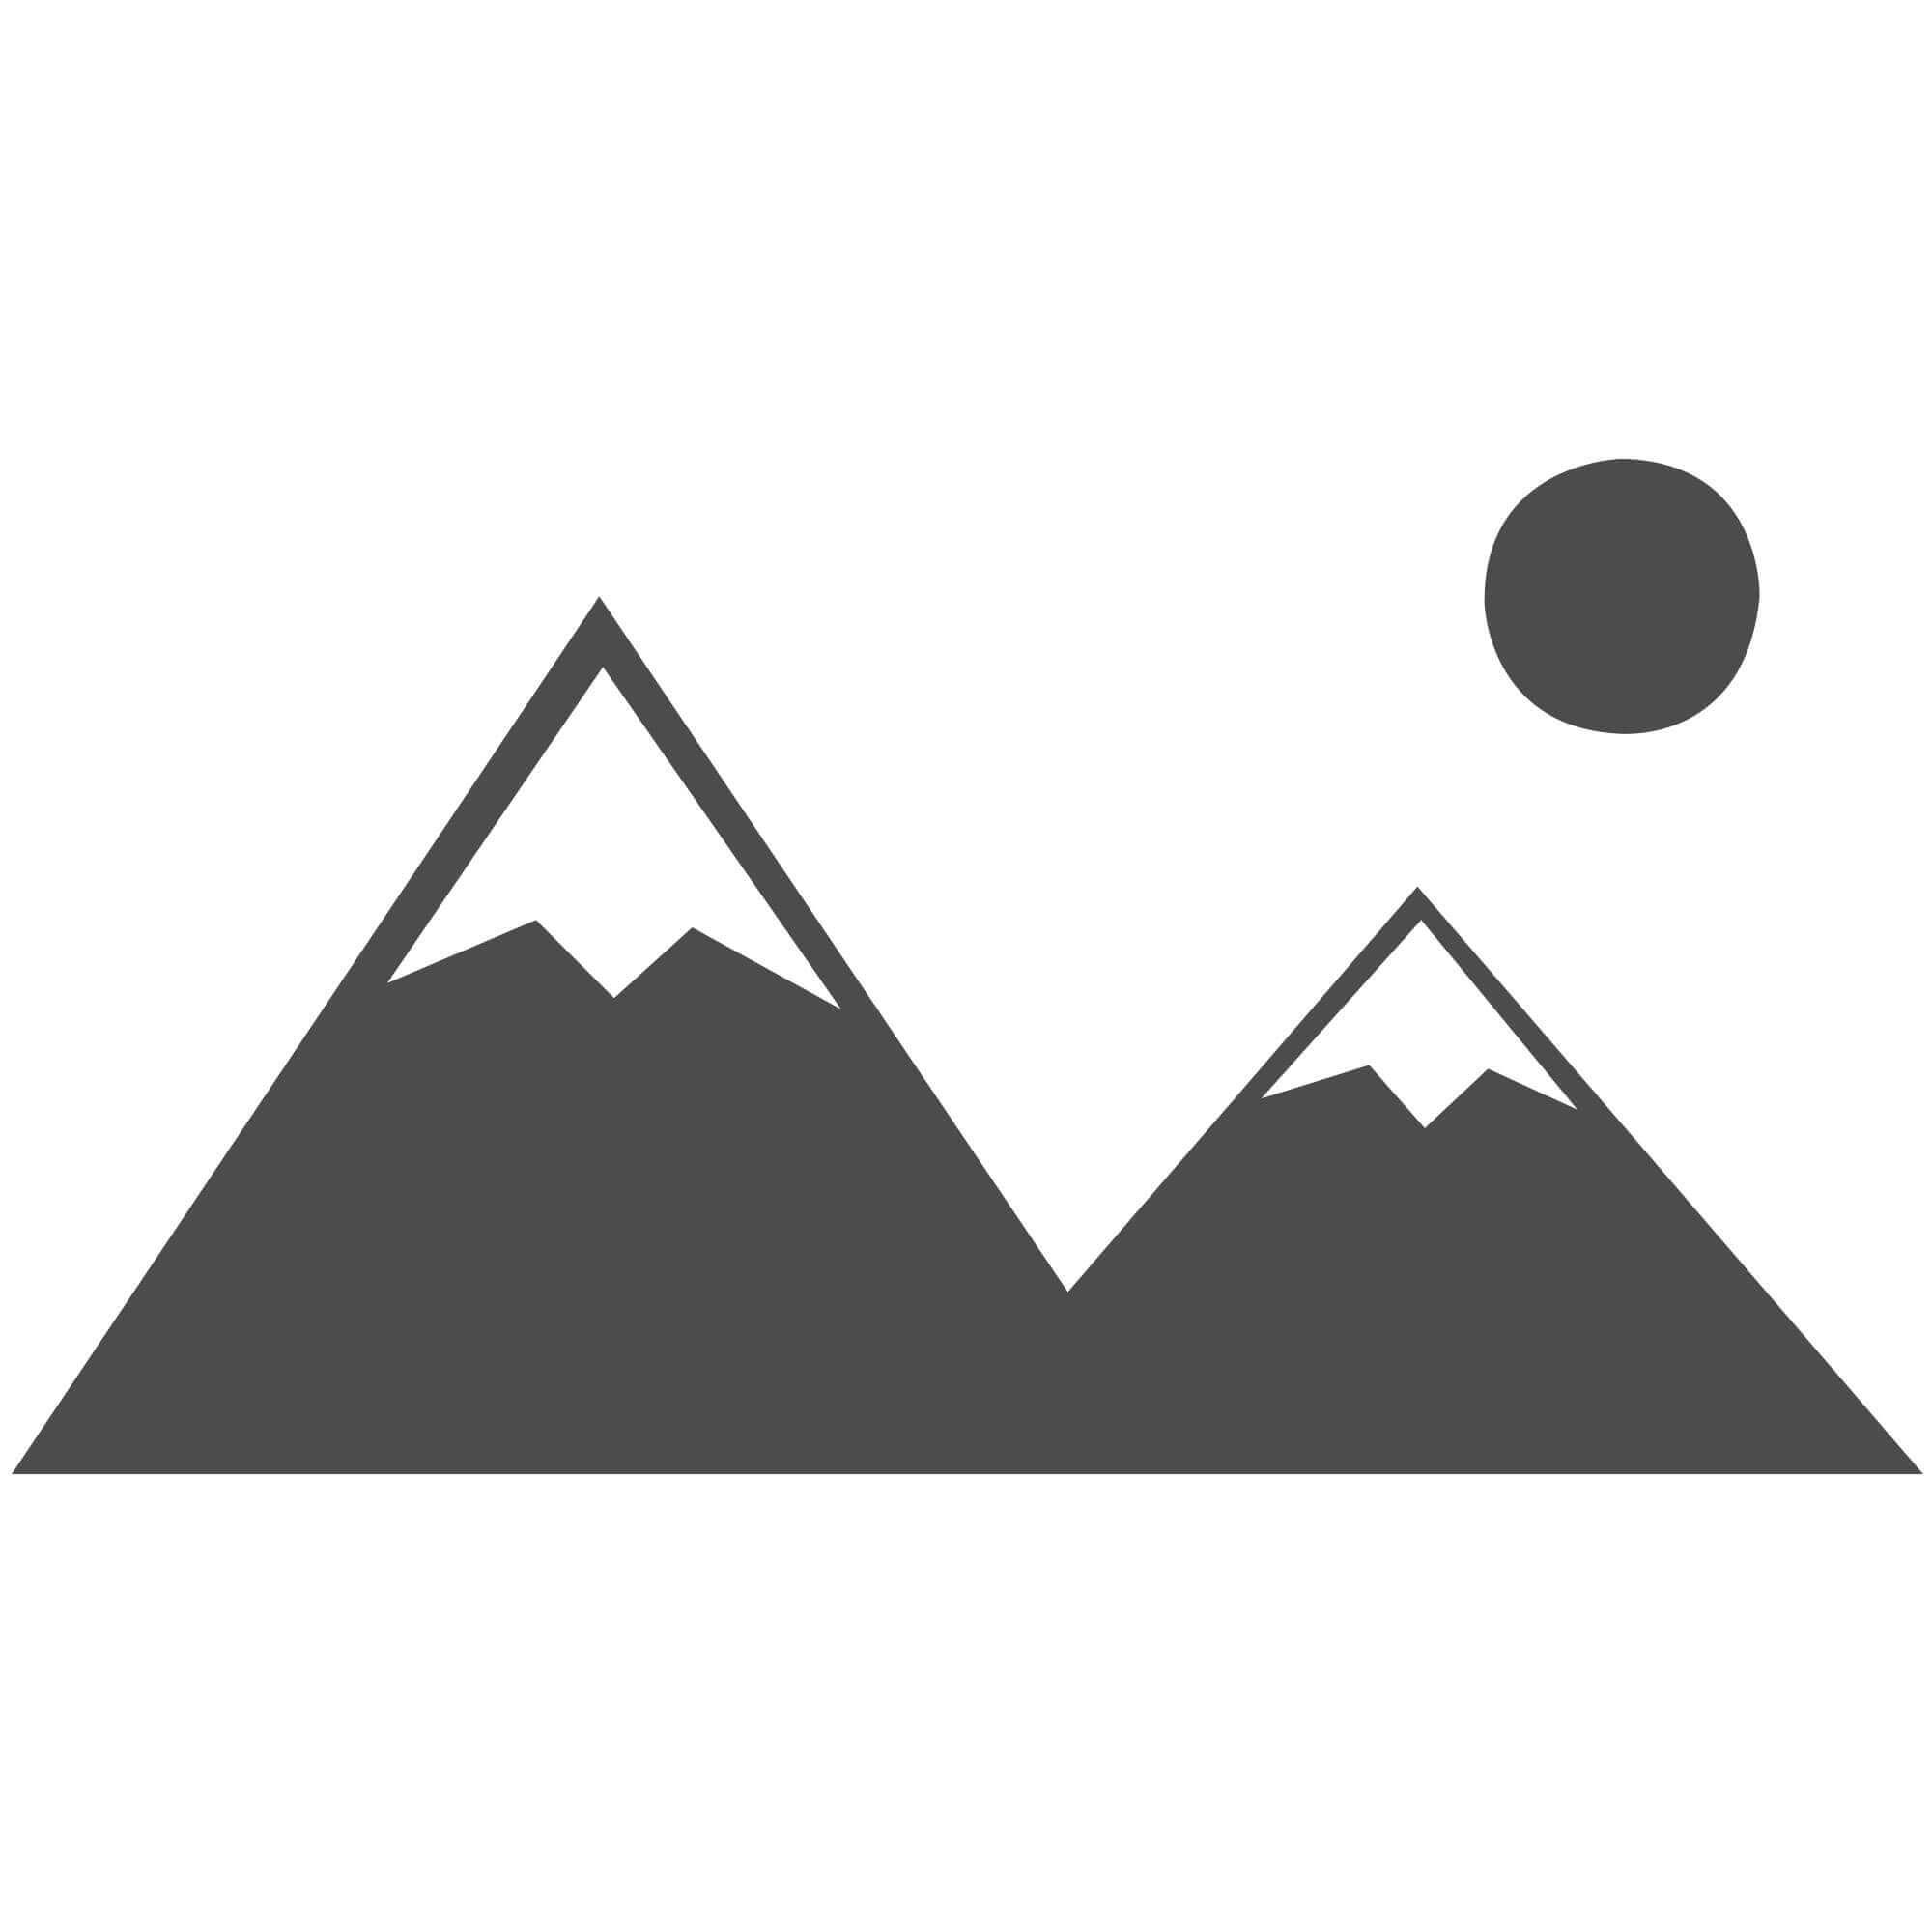 "Velvet 3D Diamonds Rug - Silver Charcoal - Size 120 x 170 cm (4' x 5'7"")"